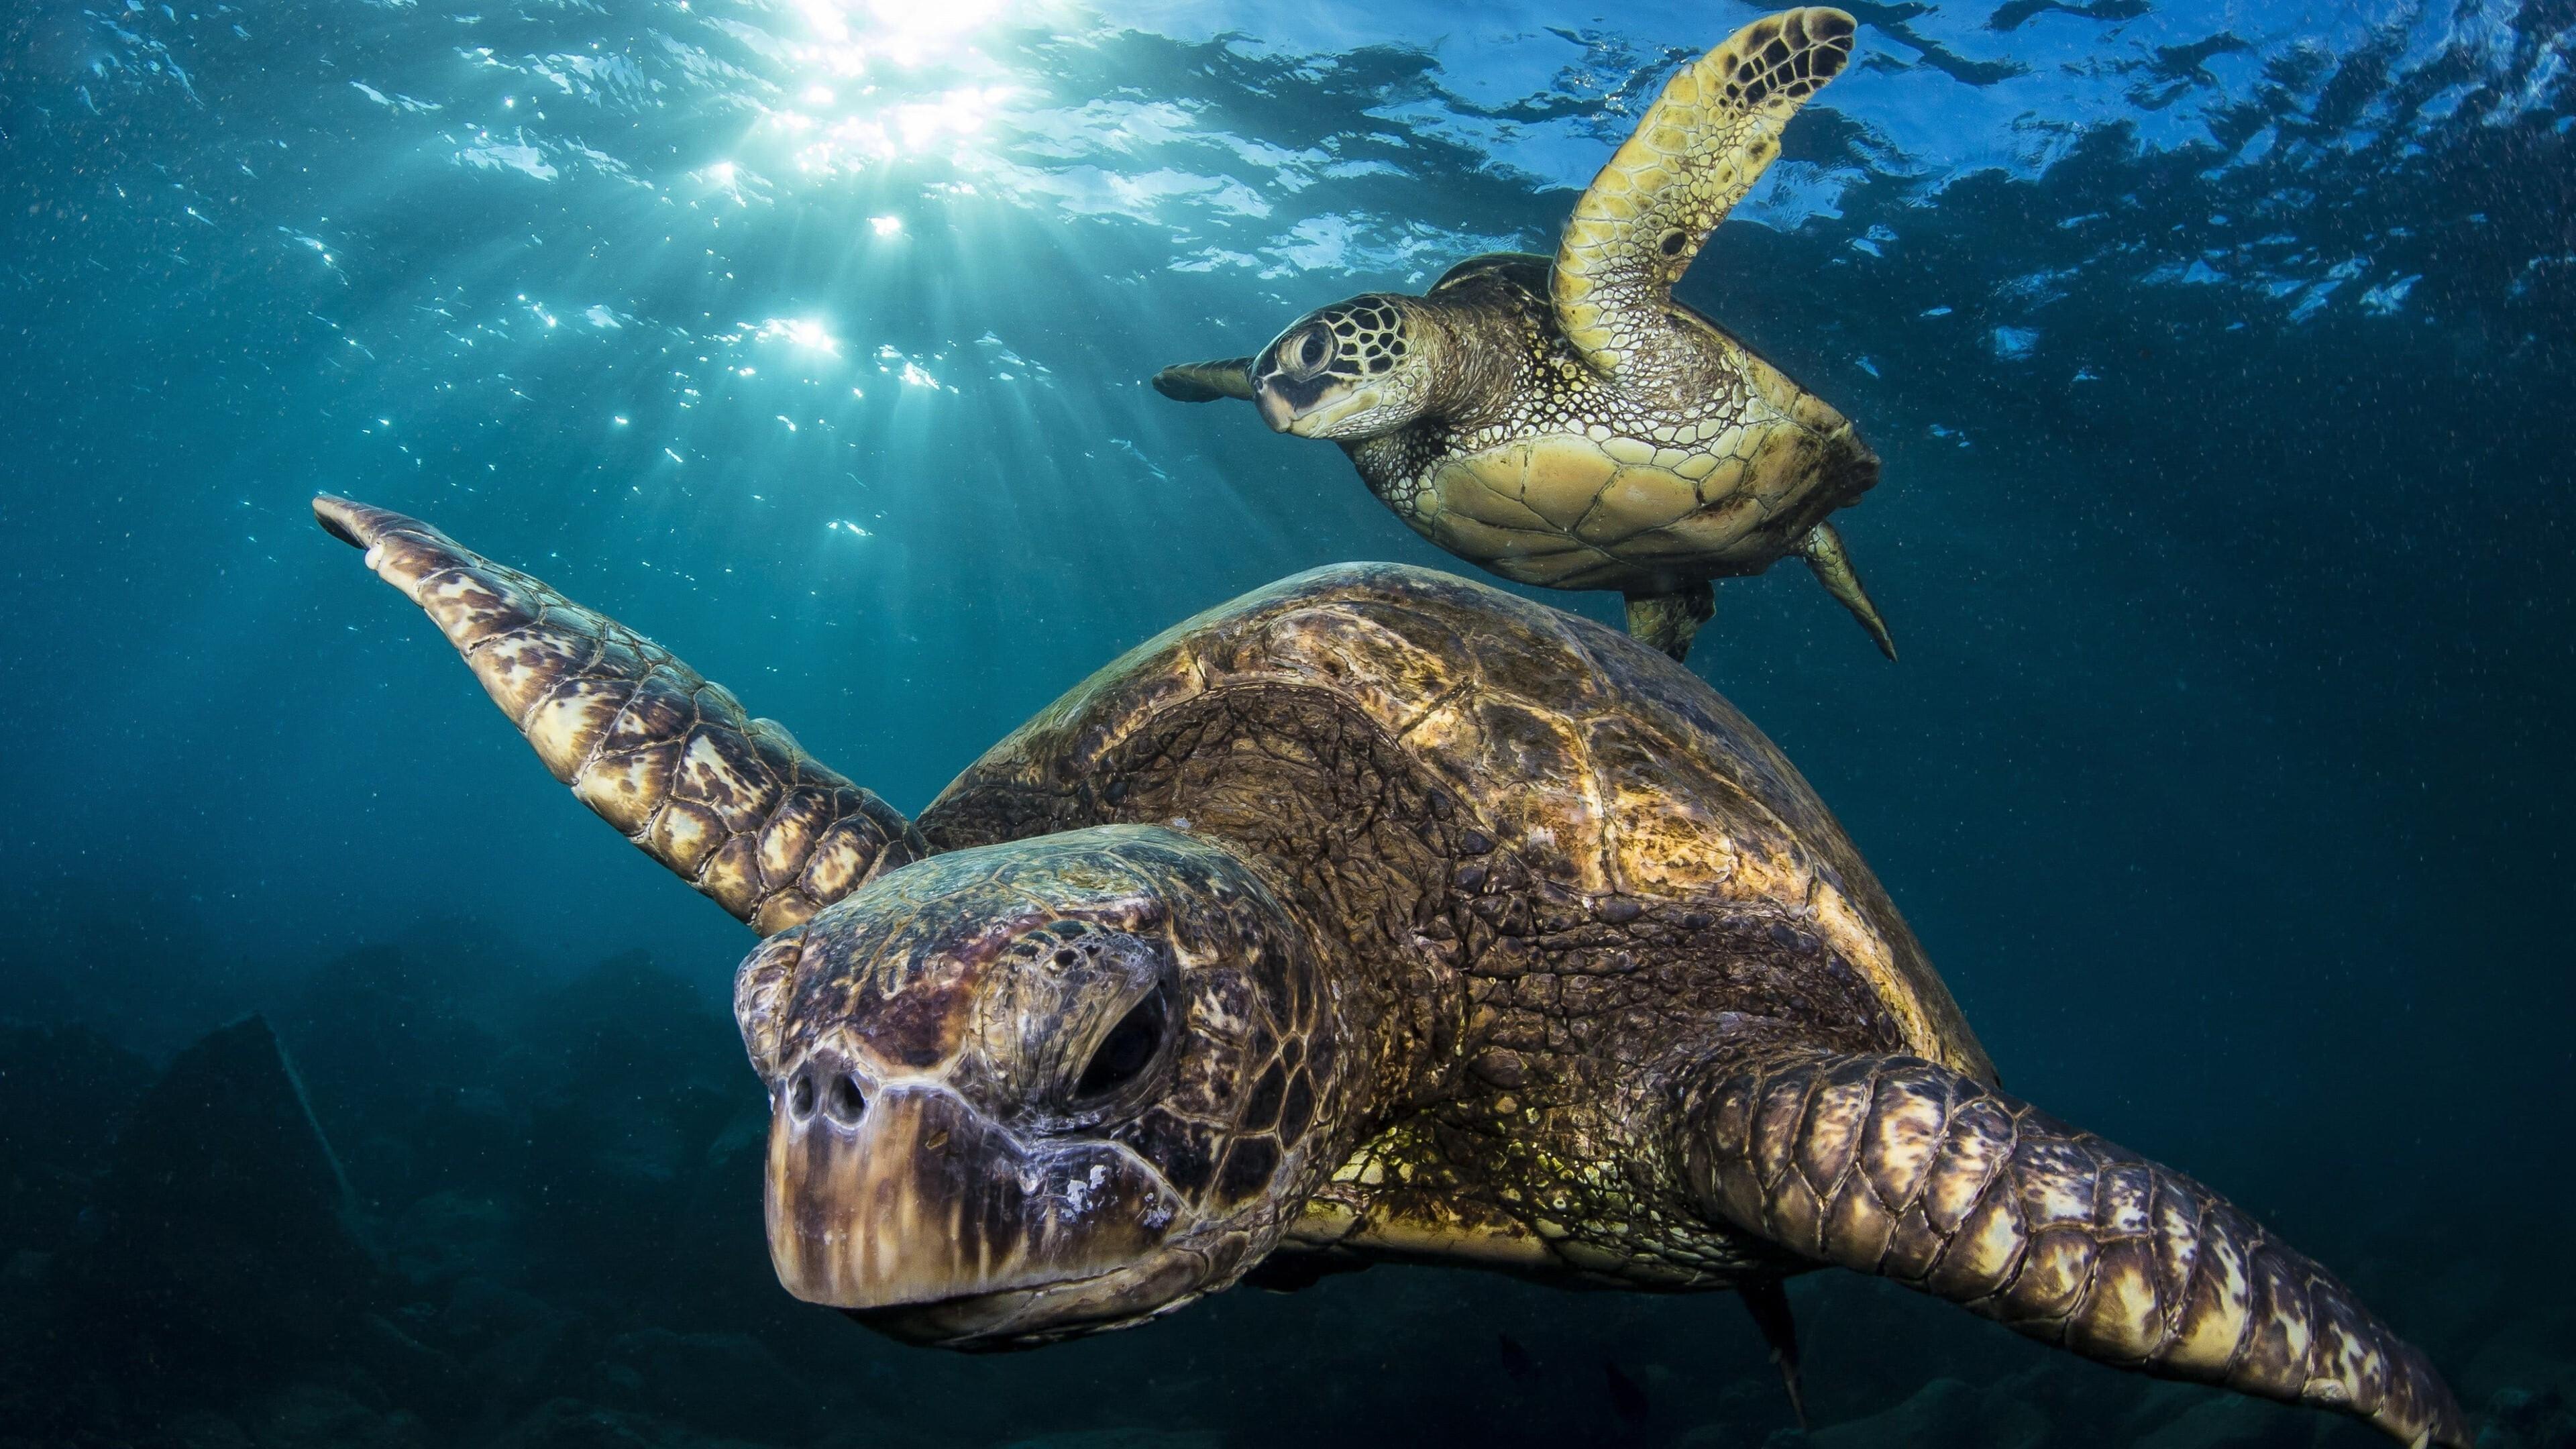 2 Turtle in Sea | HD Wallpapers